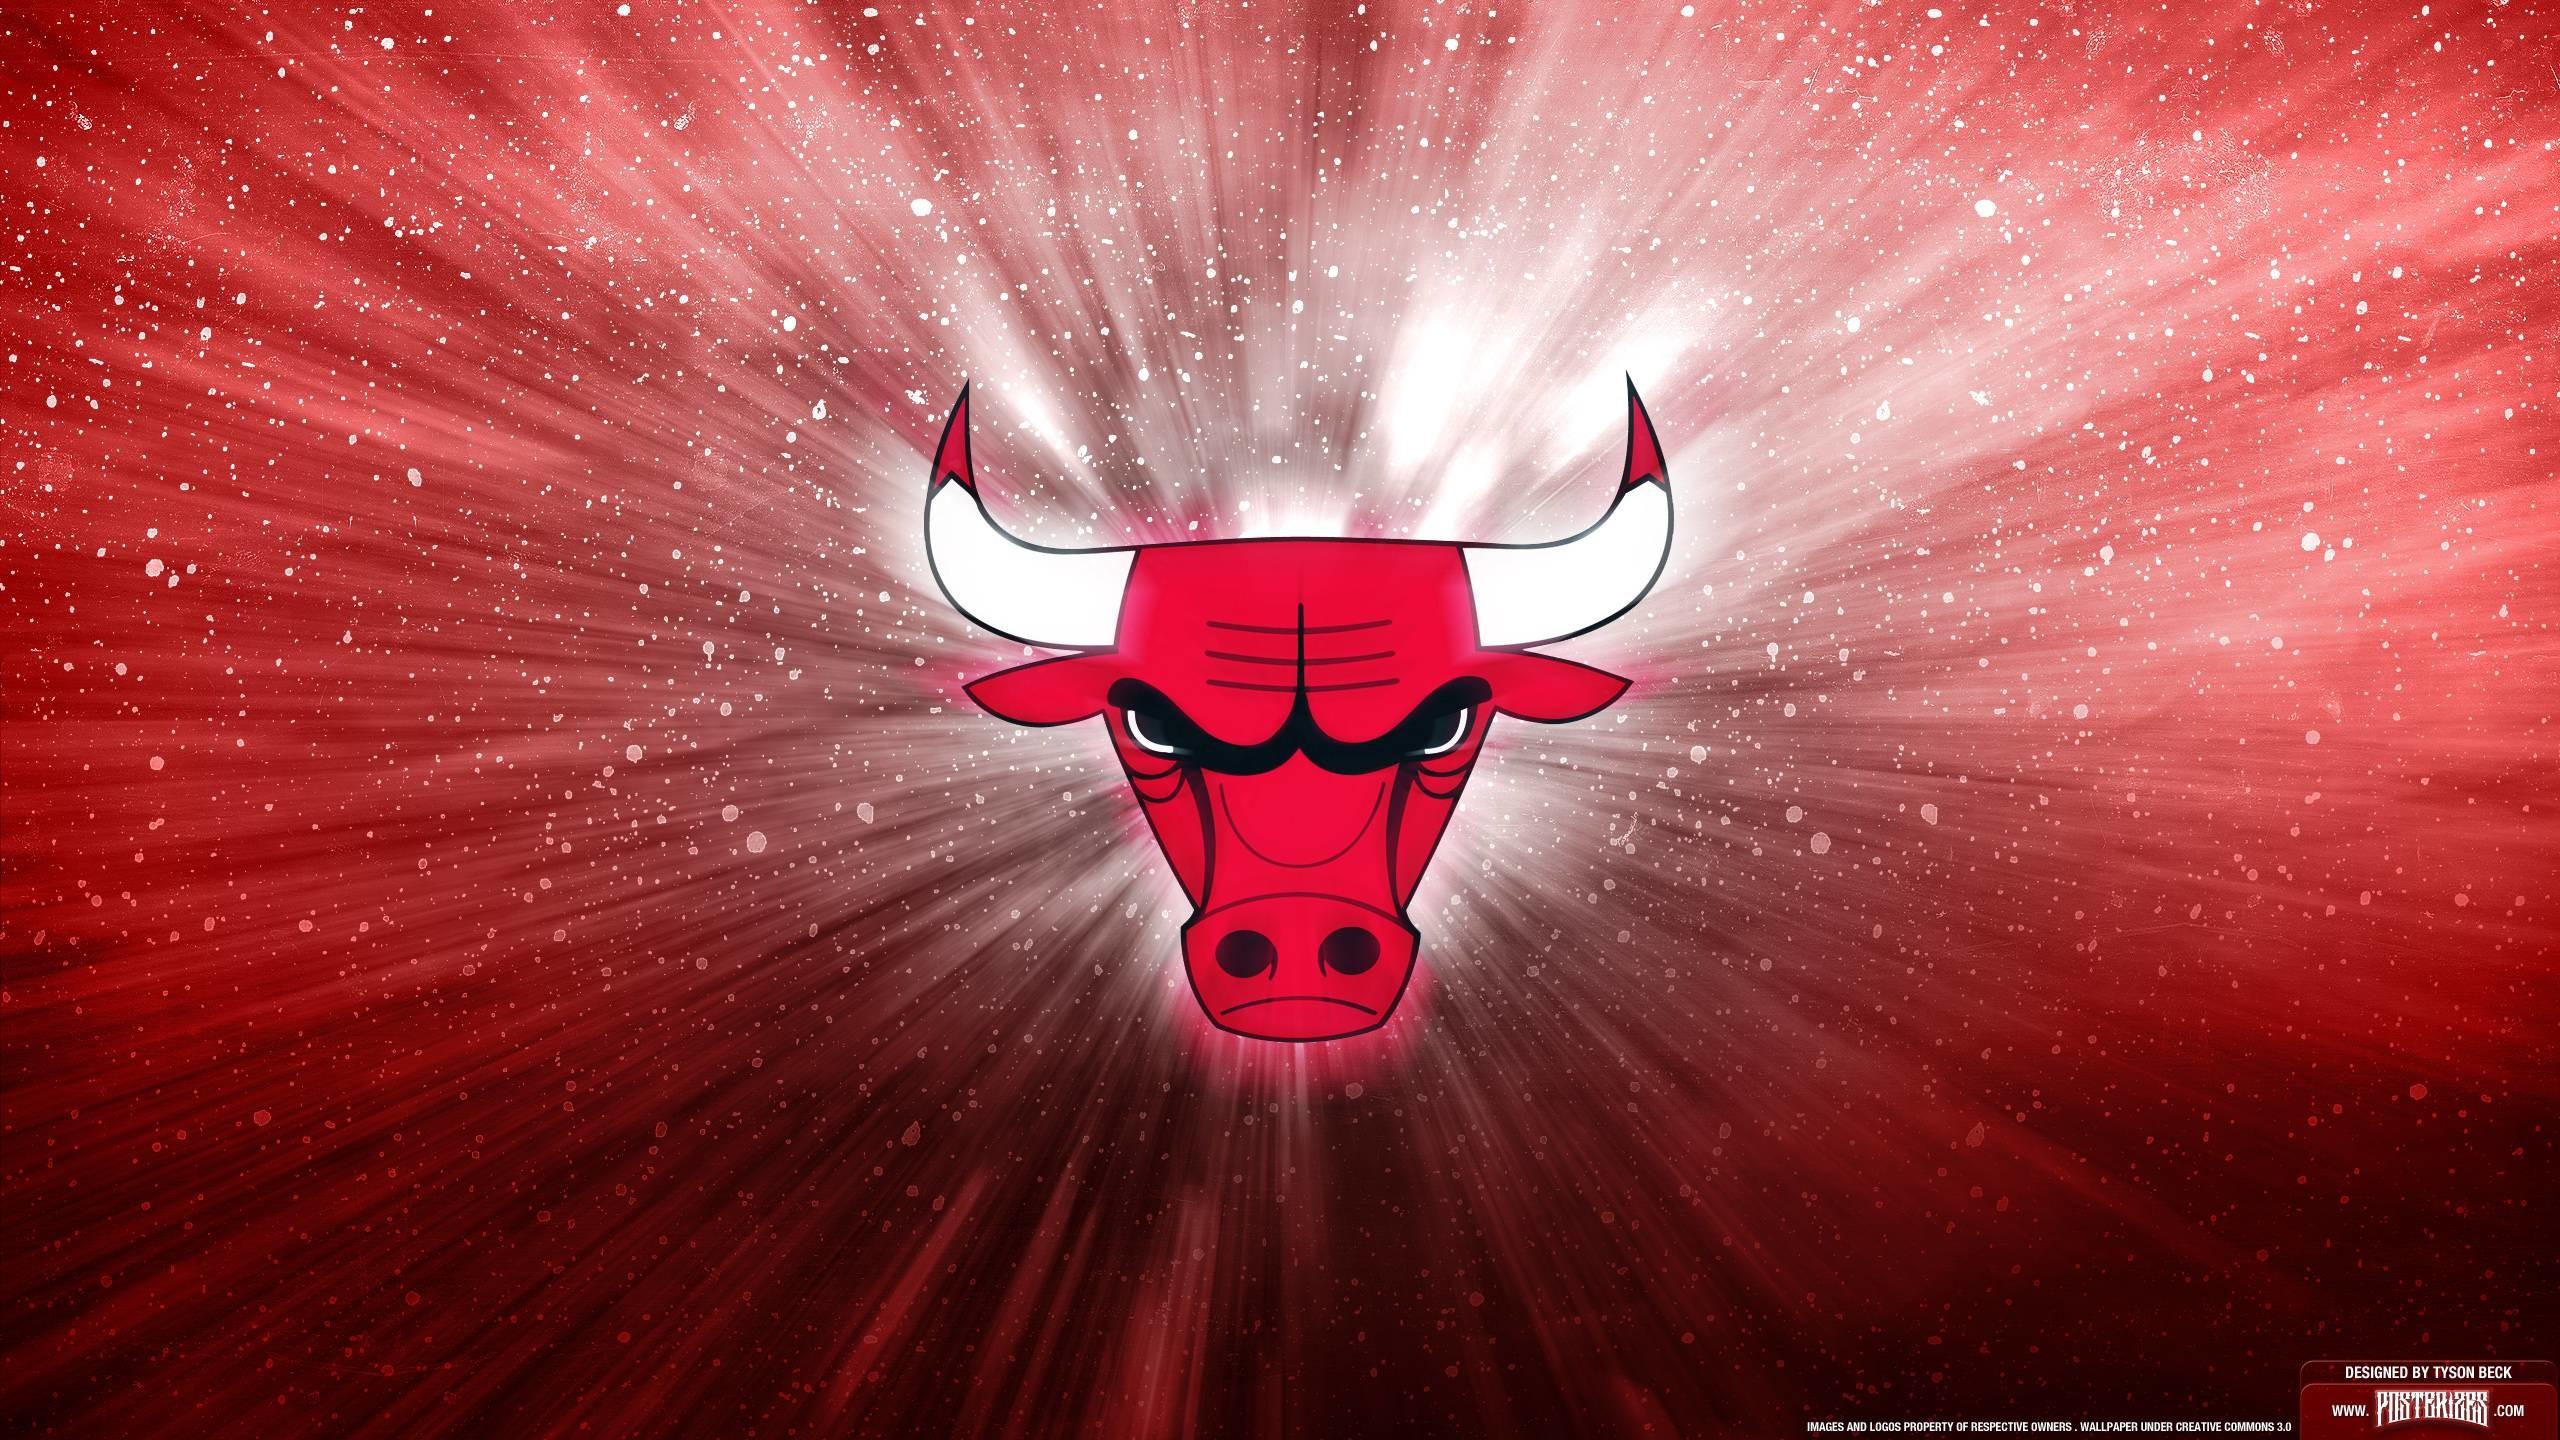 Chicago Bulls | Posterizes | NBA Wallpapers & Basketball Designs .